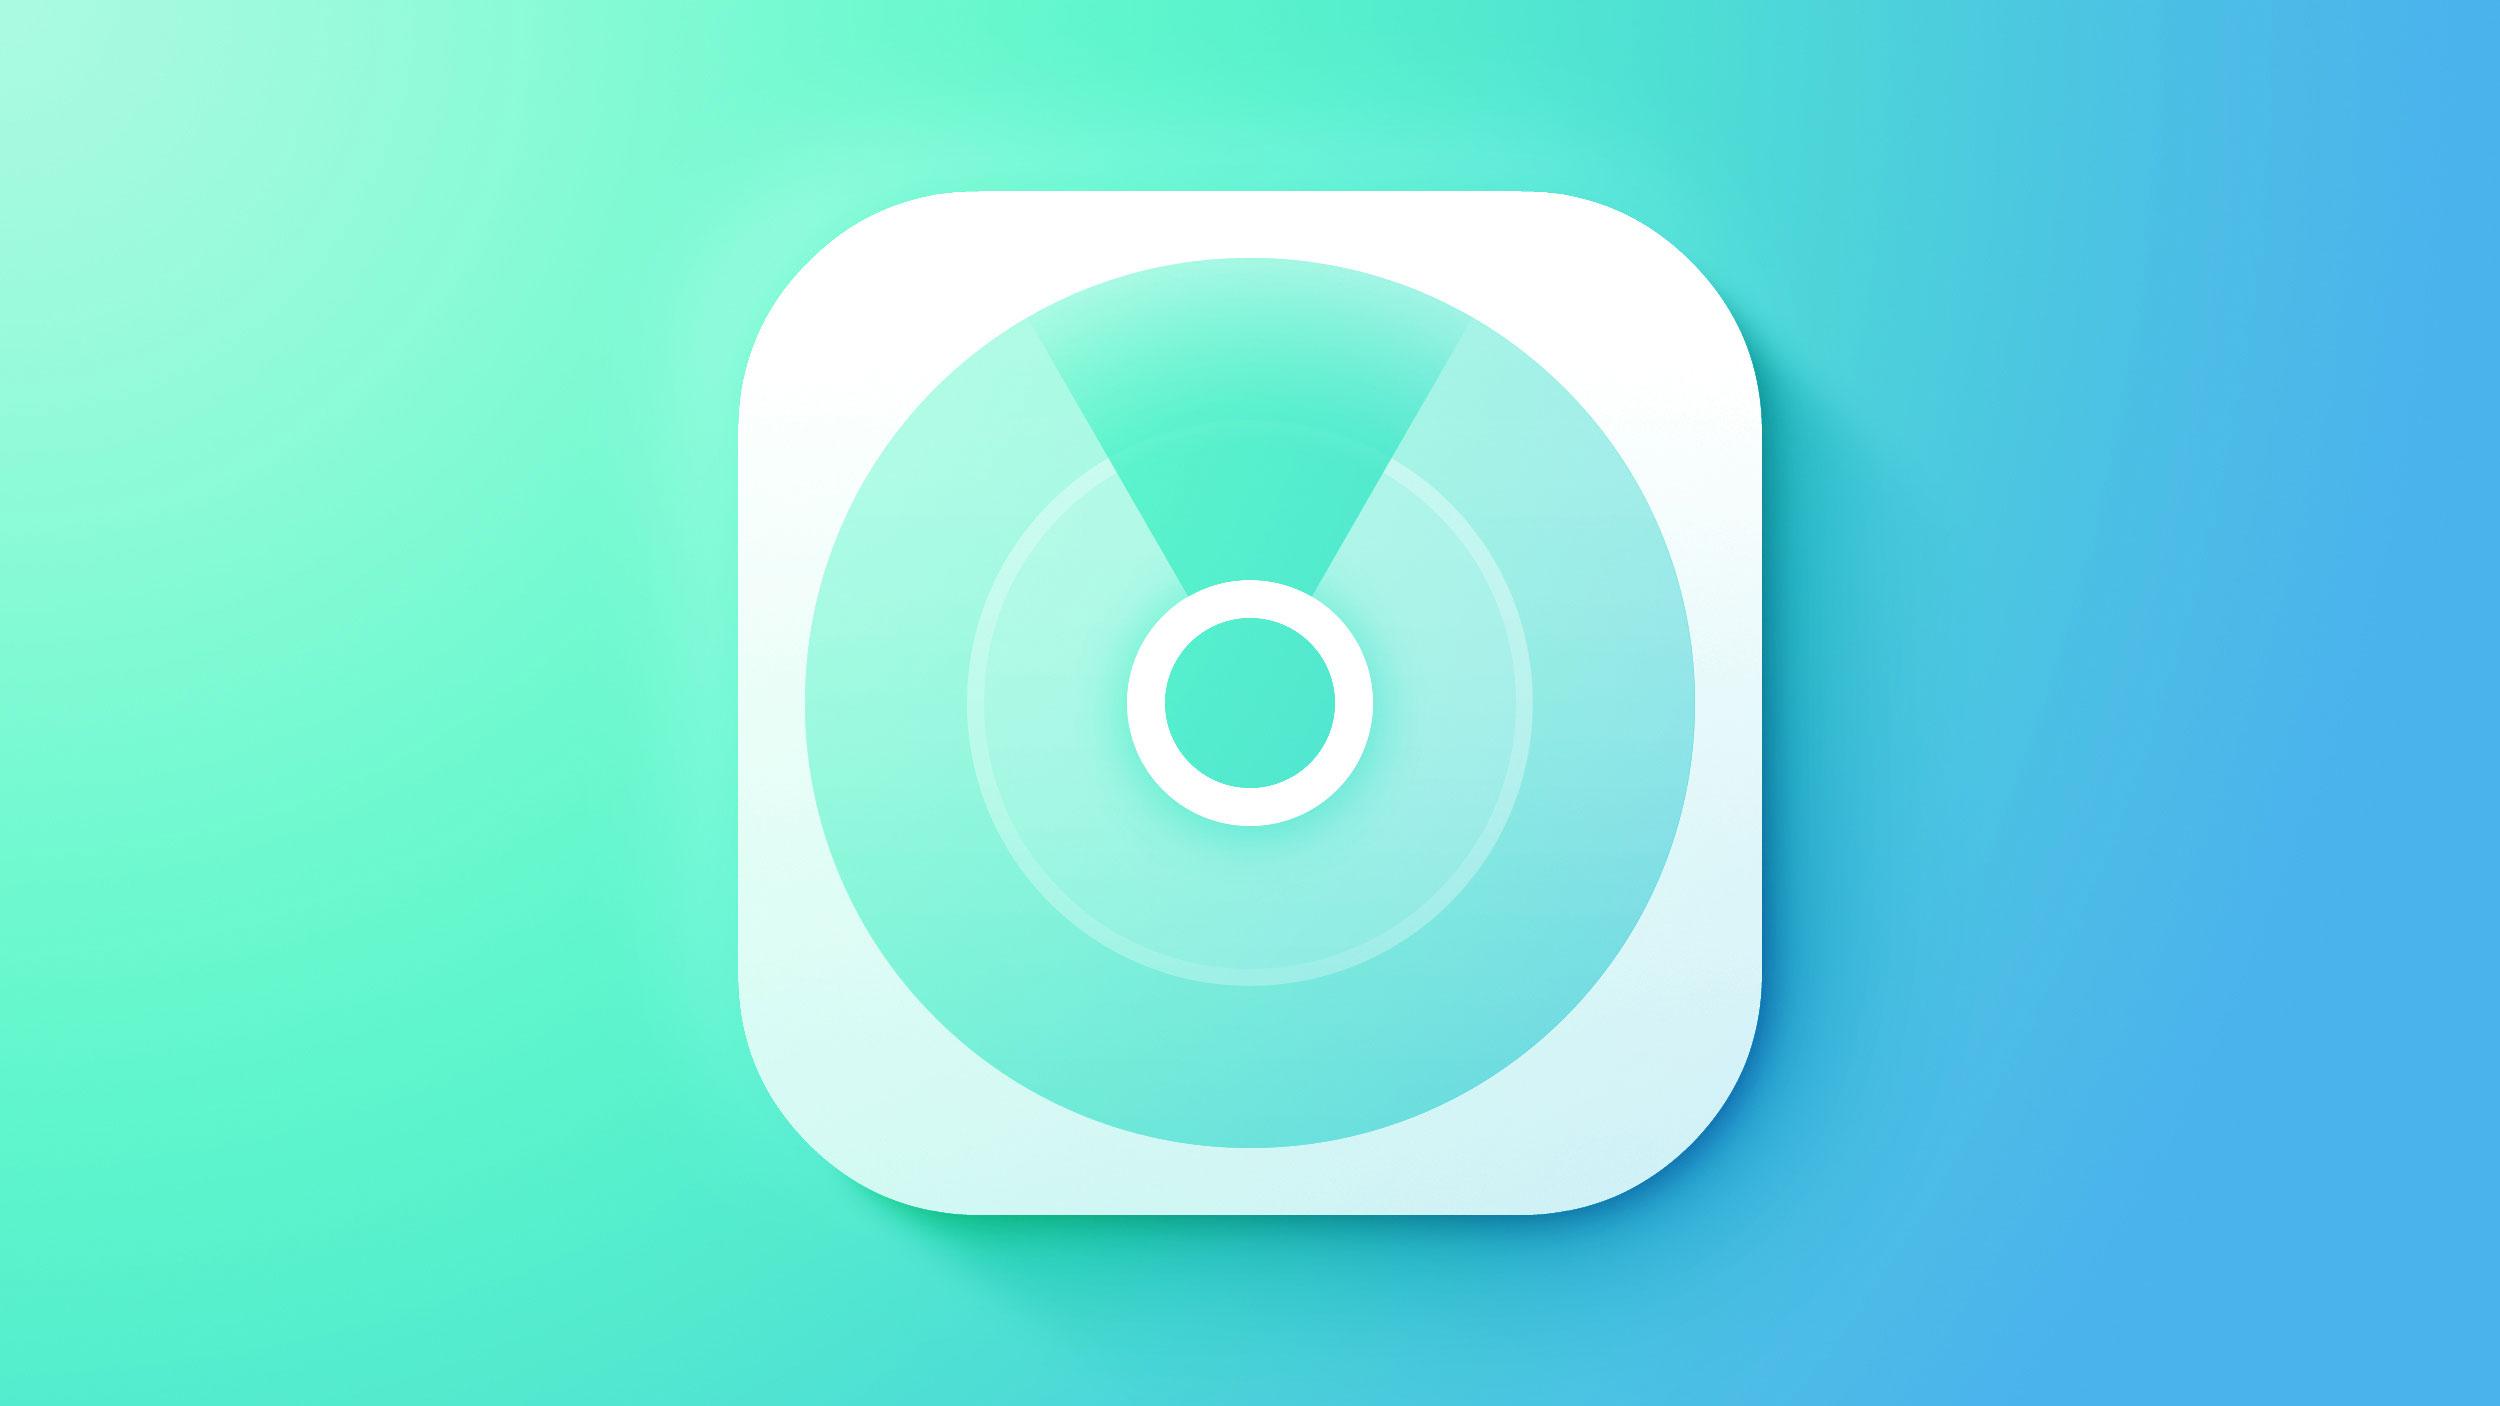 پیدا کردن آیفون خاموش مجهز به iOS 15 به لطف Find My Offline